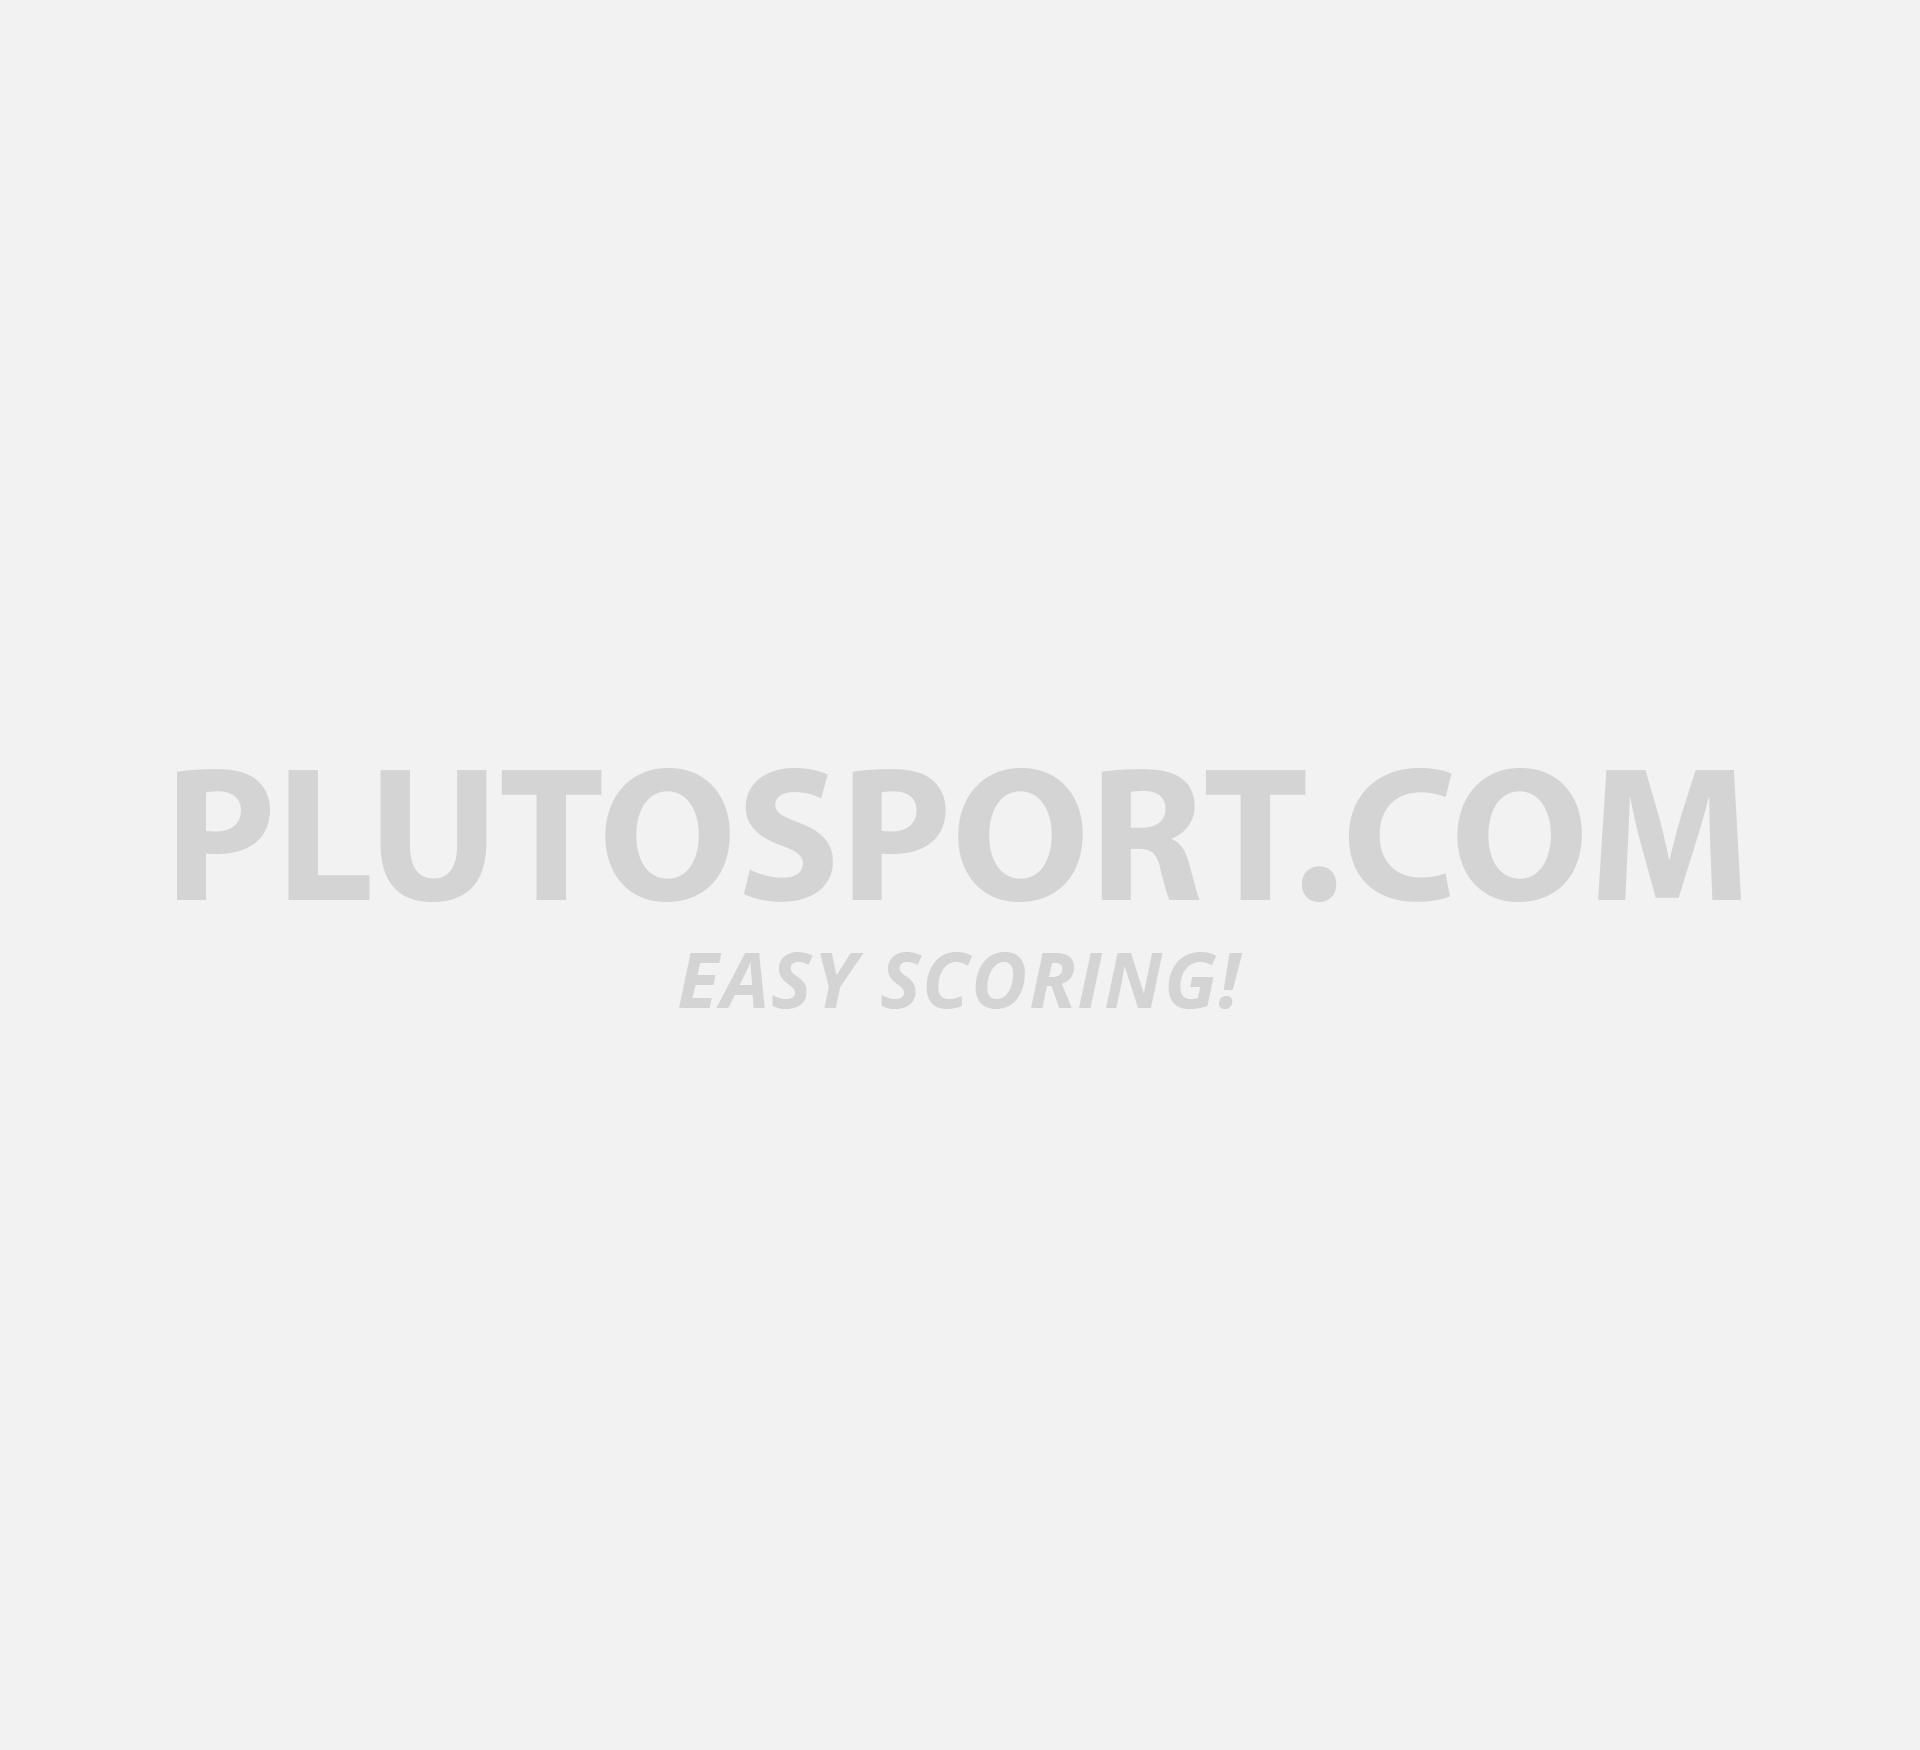 0fa02b5b9338 Sloggi Light Hipster Wms - Underwear - Clothing - Lifestyle - Sports |  Plutosport